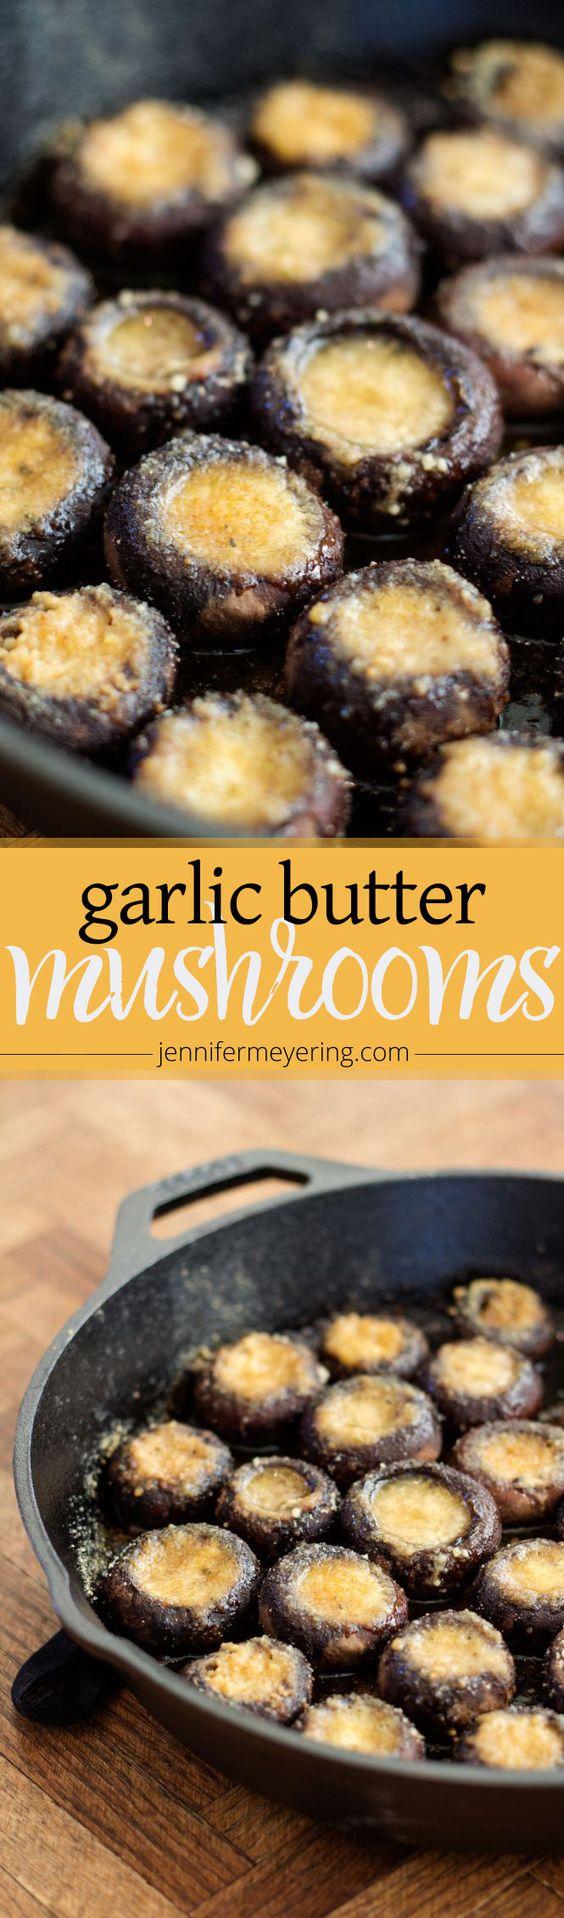 Garlic butter, Roasted mushrooms and Mushrooms on Pinterest